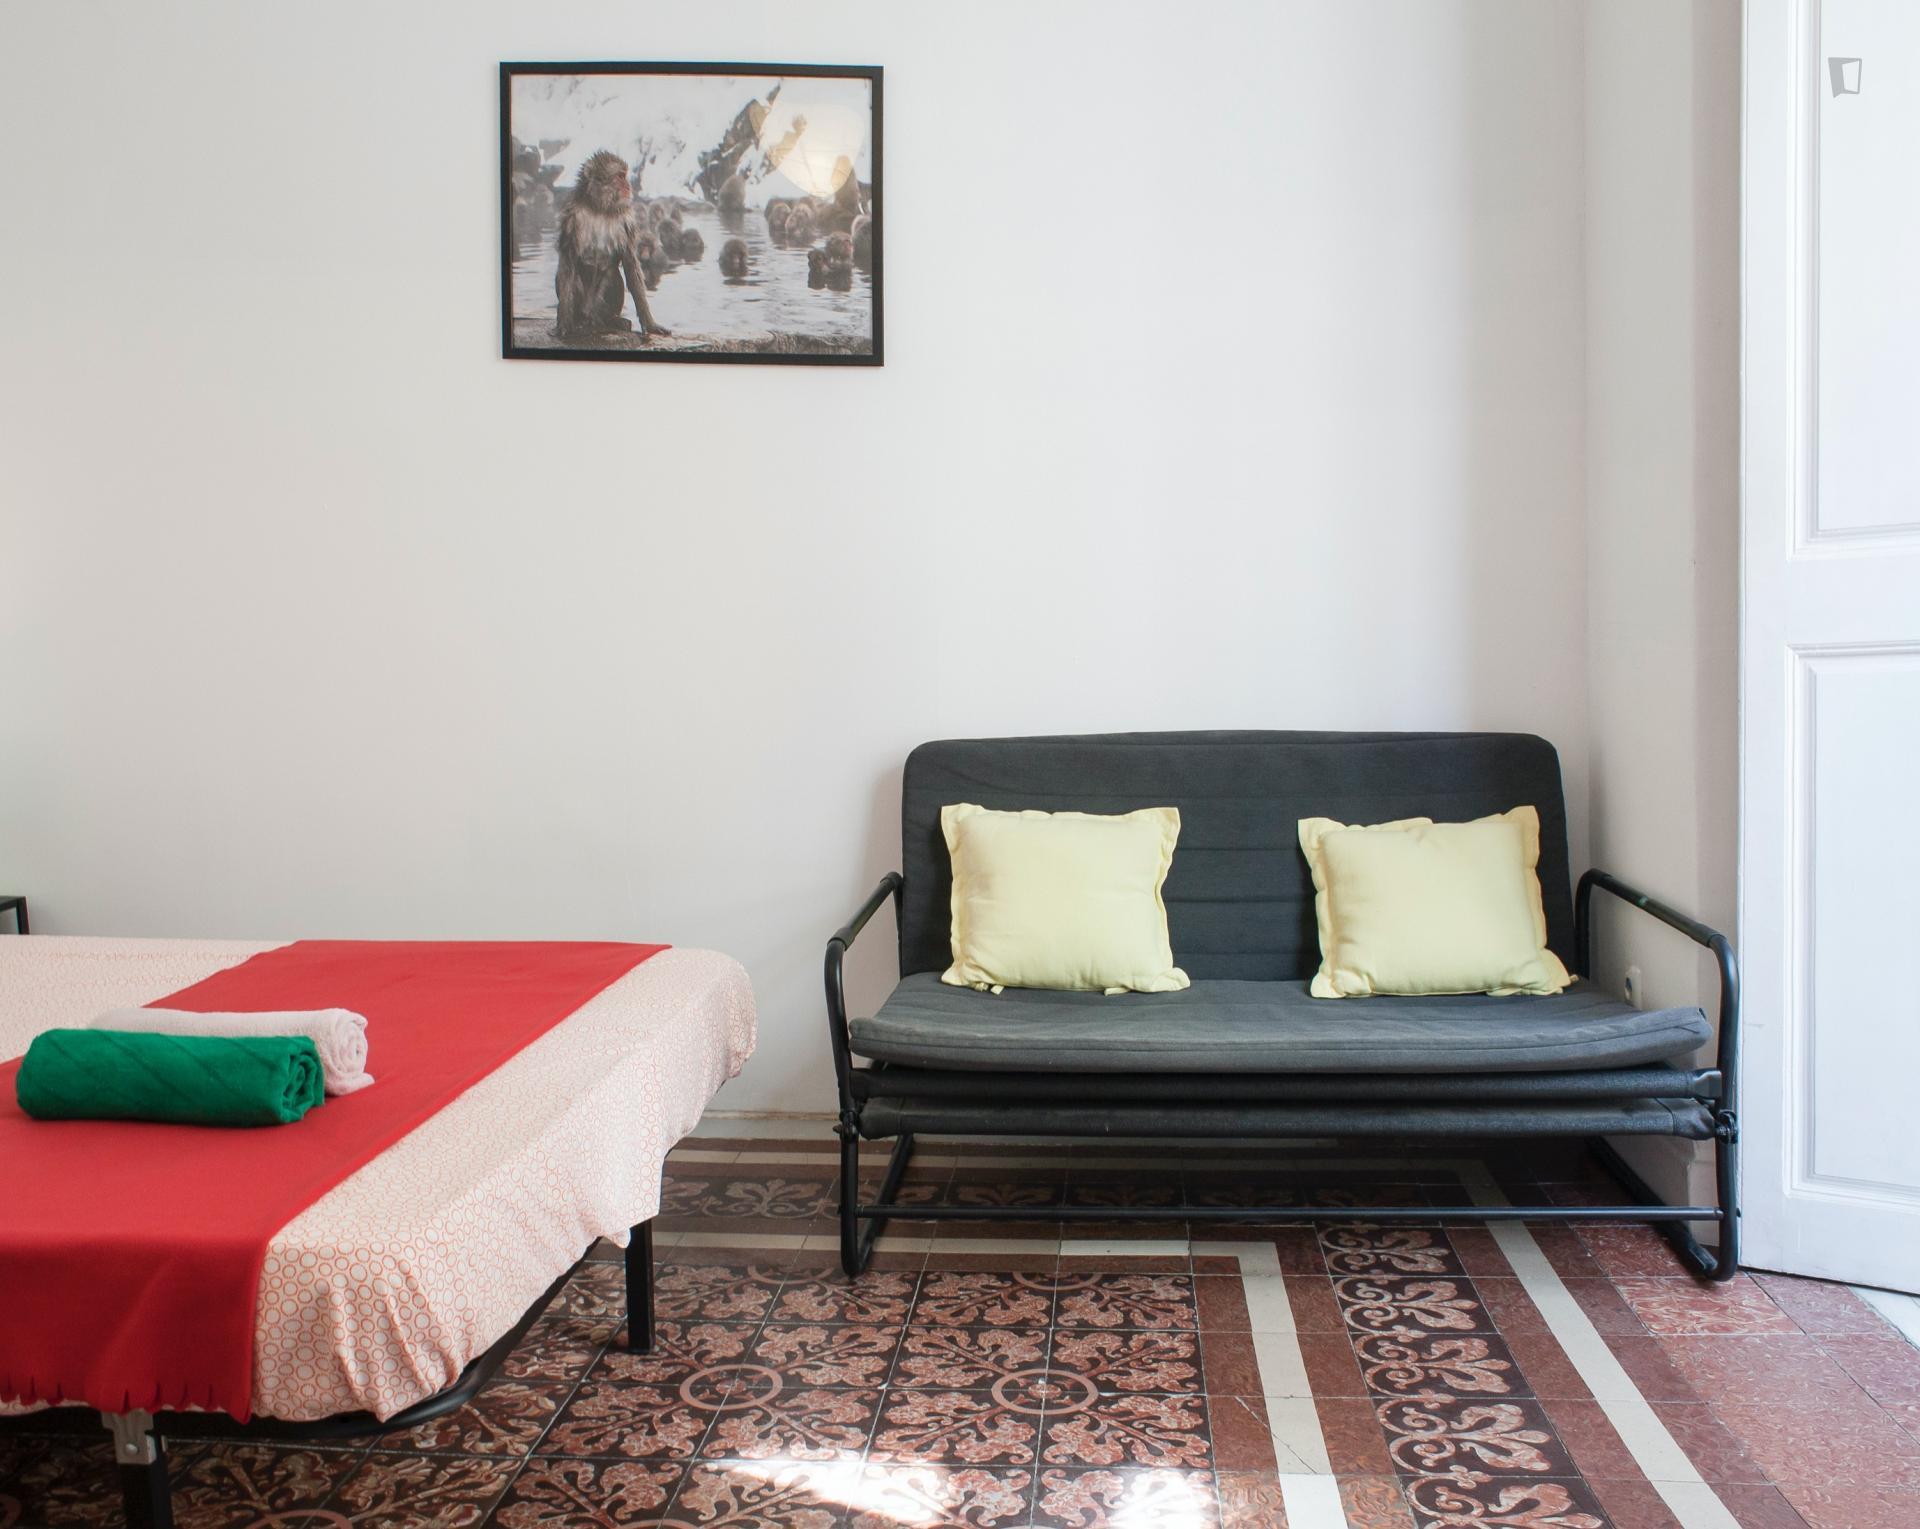 Comedias- Spacious Room for Expat in Malaga